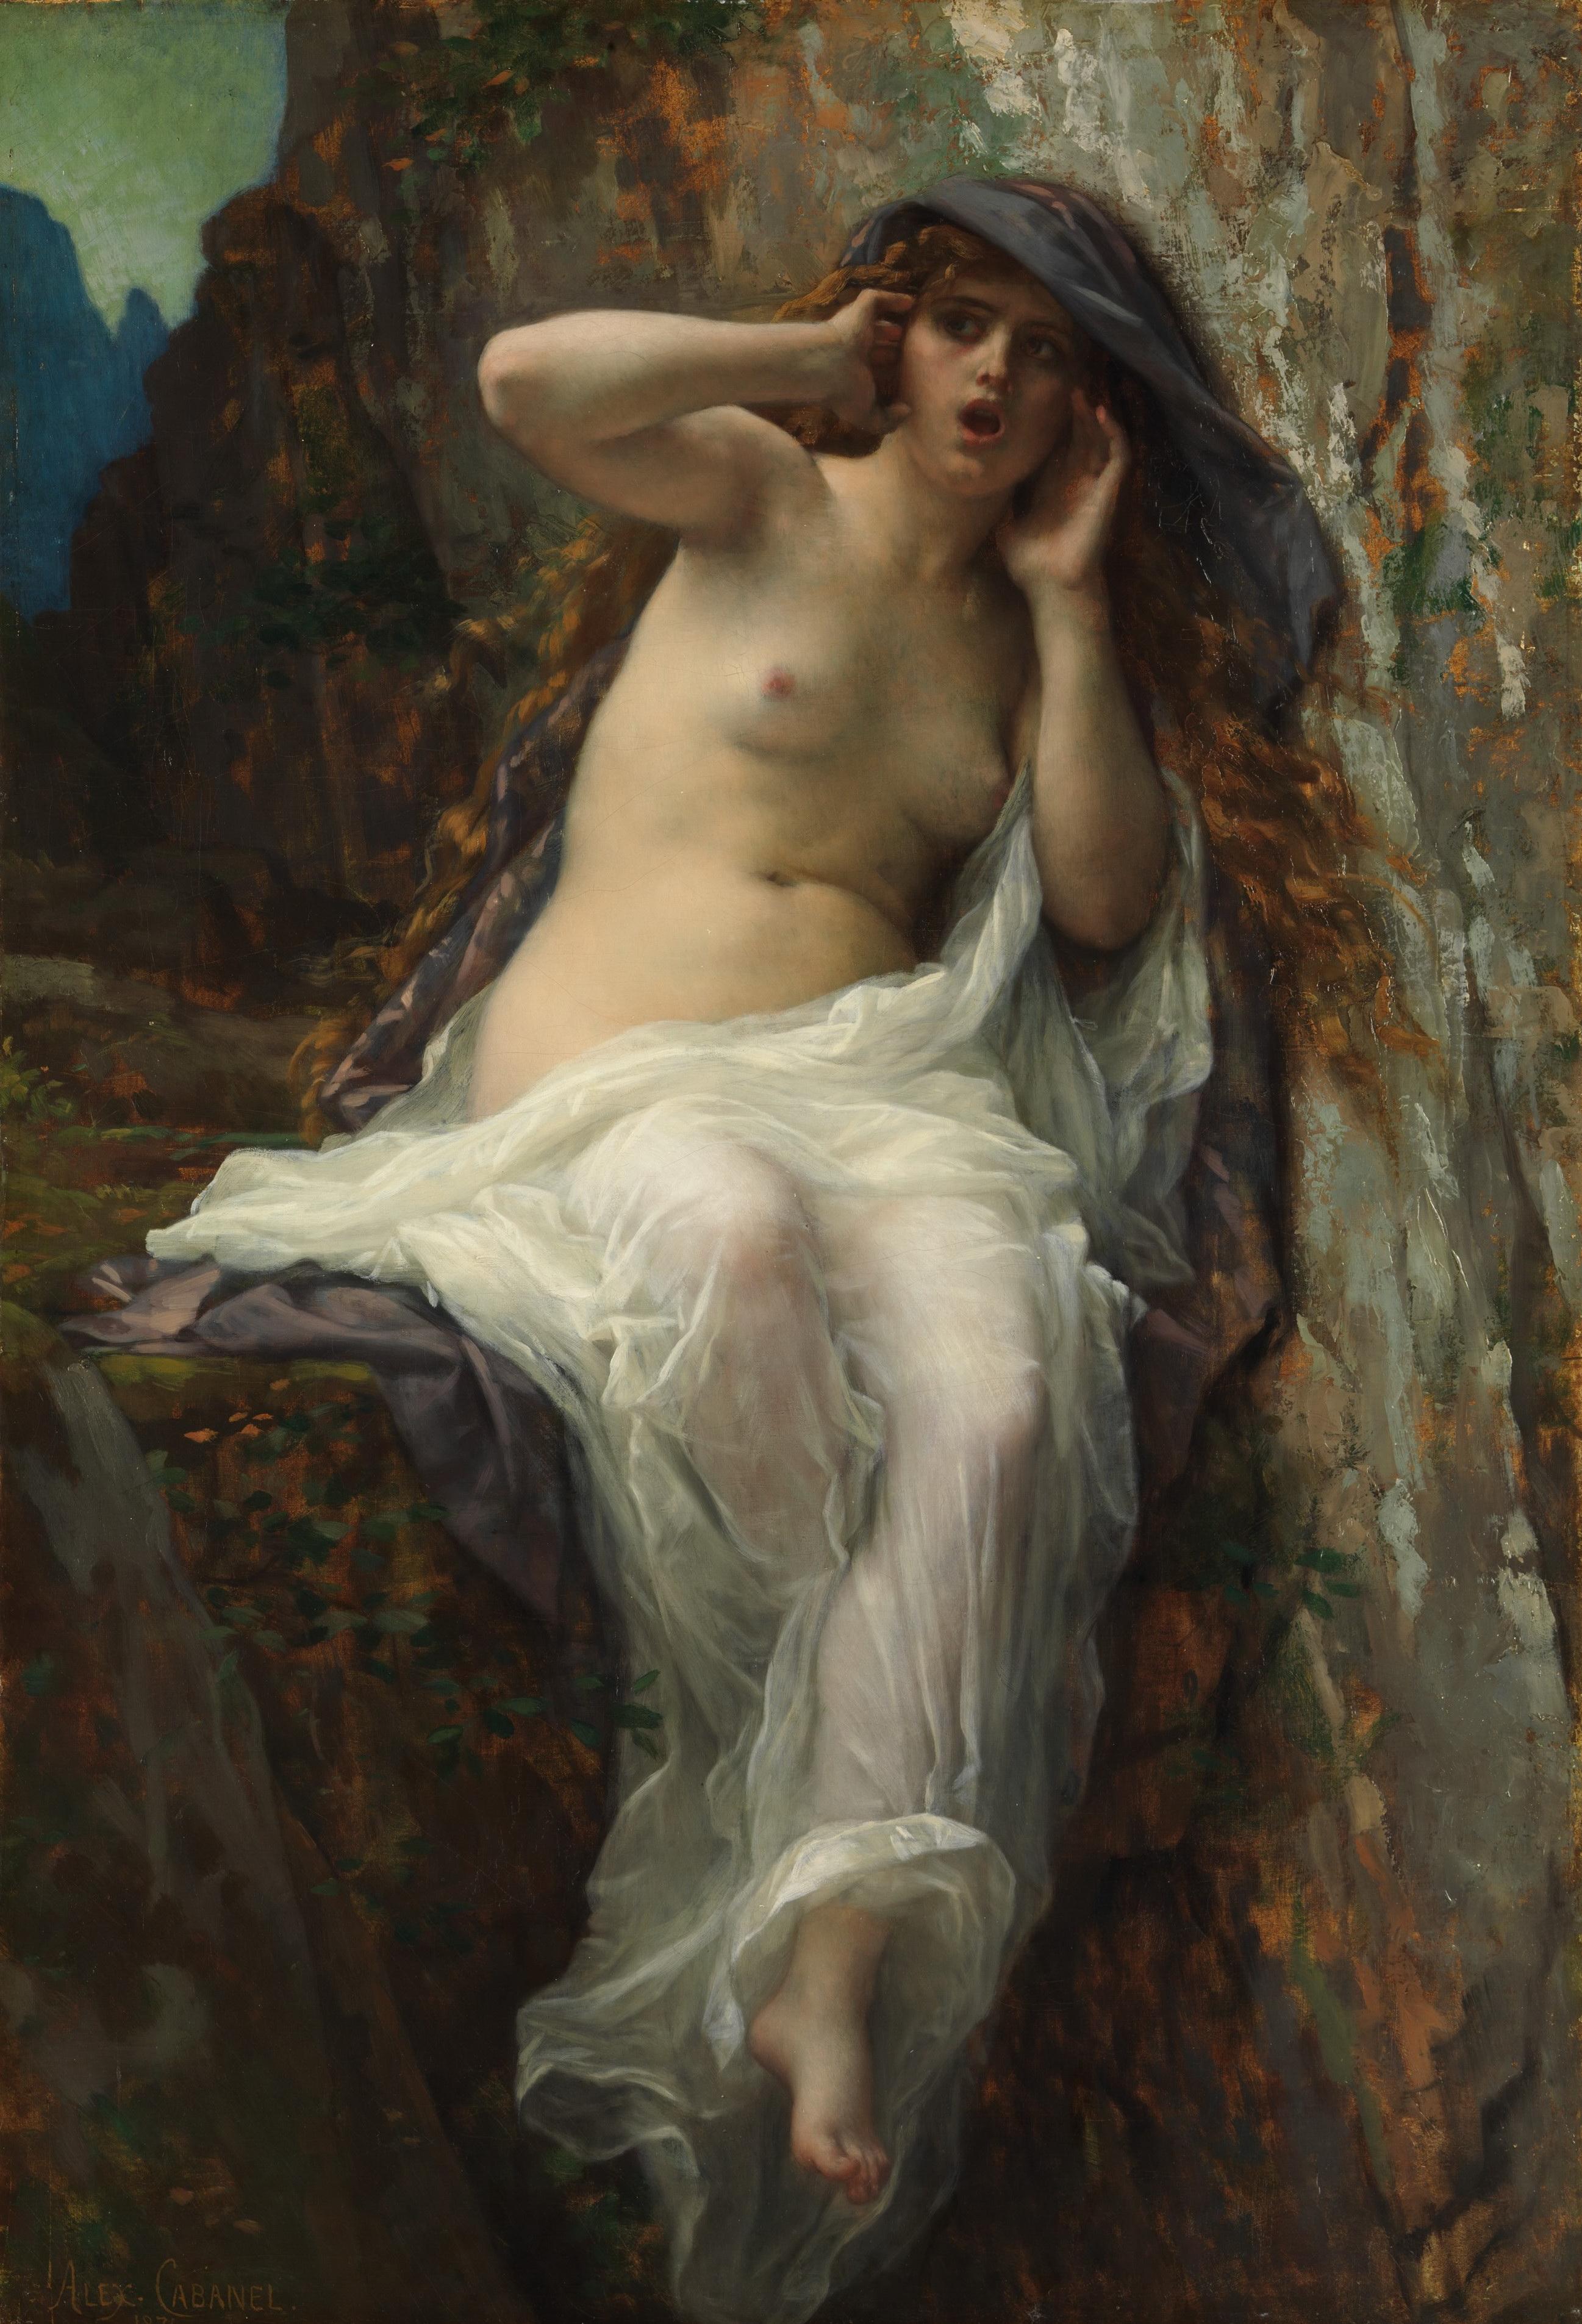 Alexandre Cabanel, 1824-1889. Эхо. 1874. 97.8 x 66.7 см. Нью-Йорк, Метрополитен